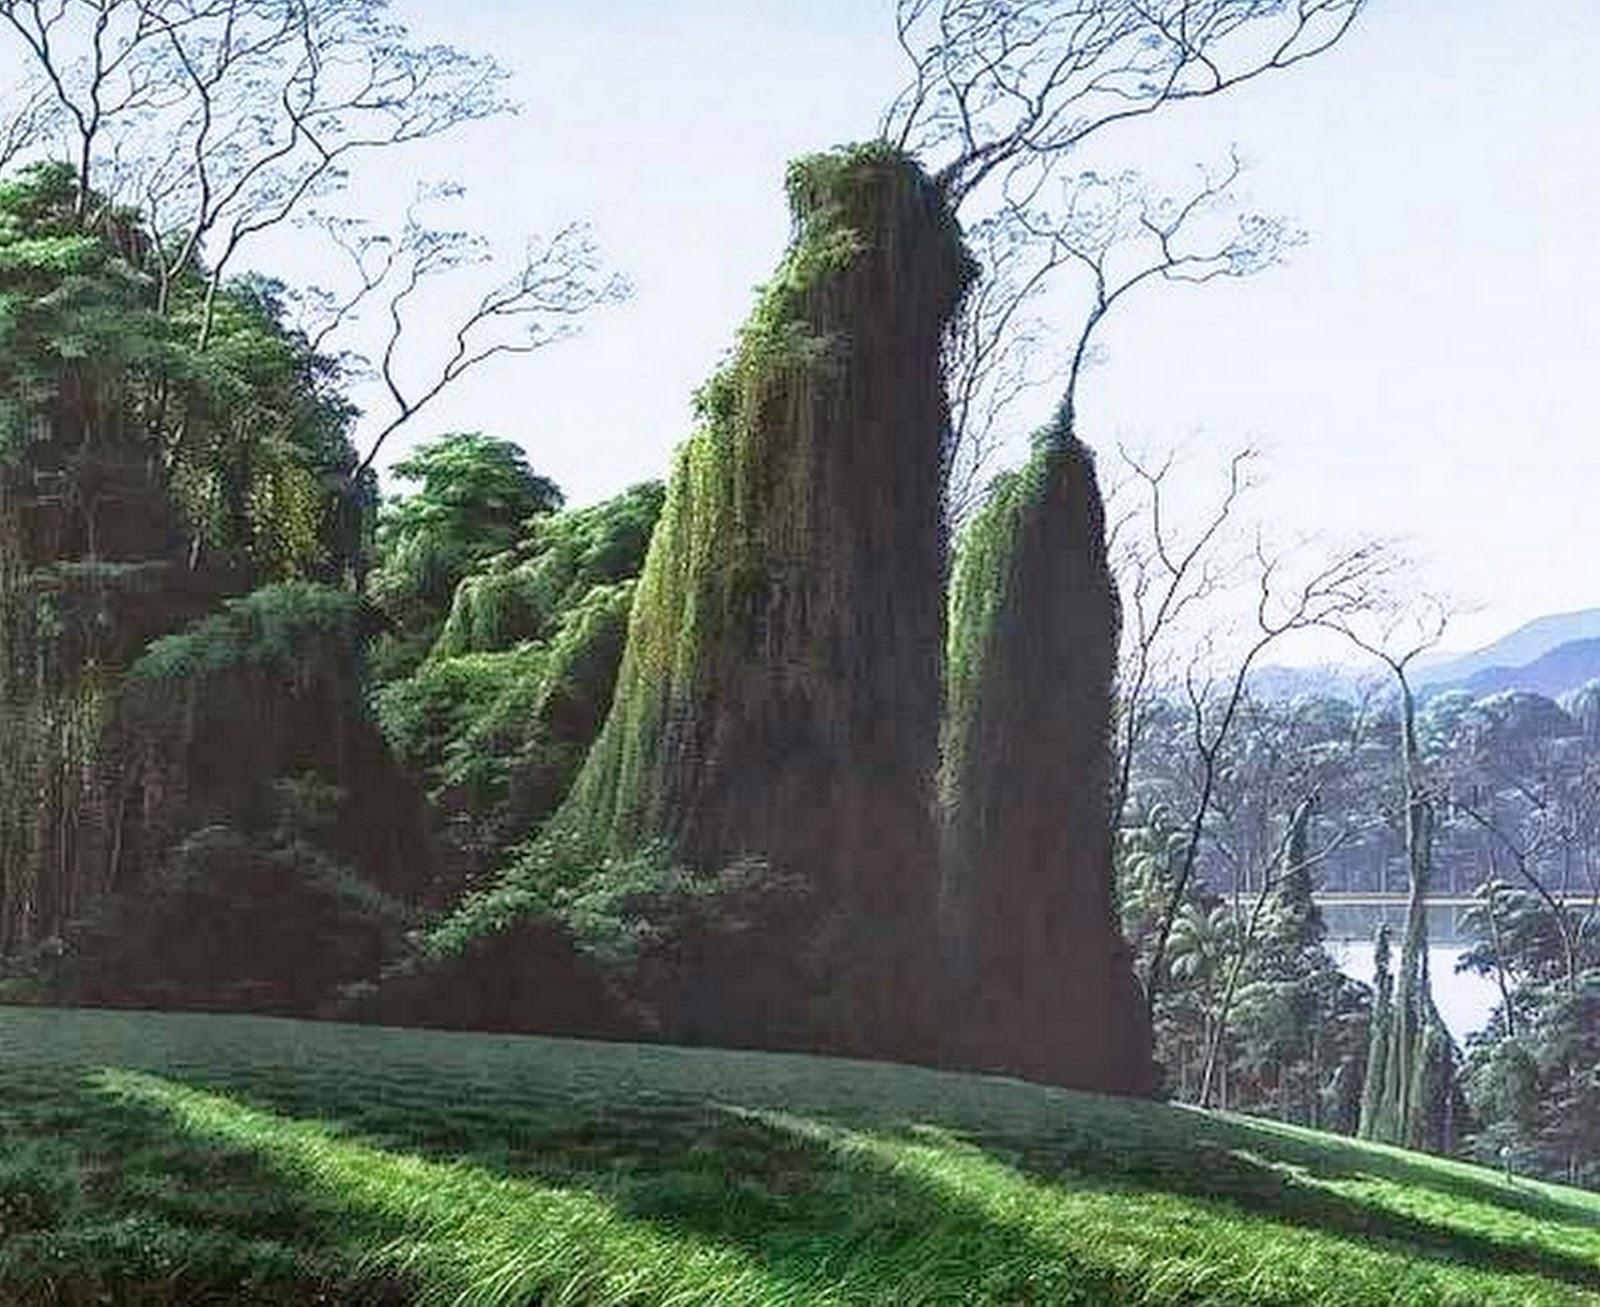 lindos-paisajes-pintados-con-oleo